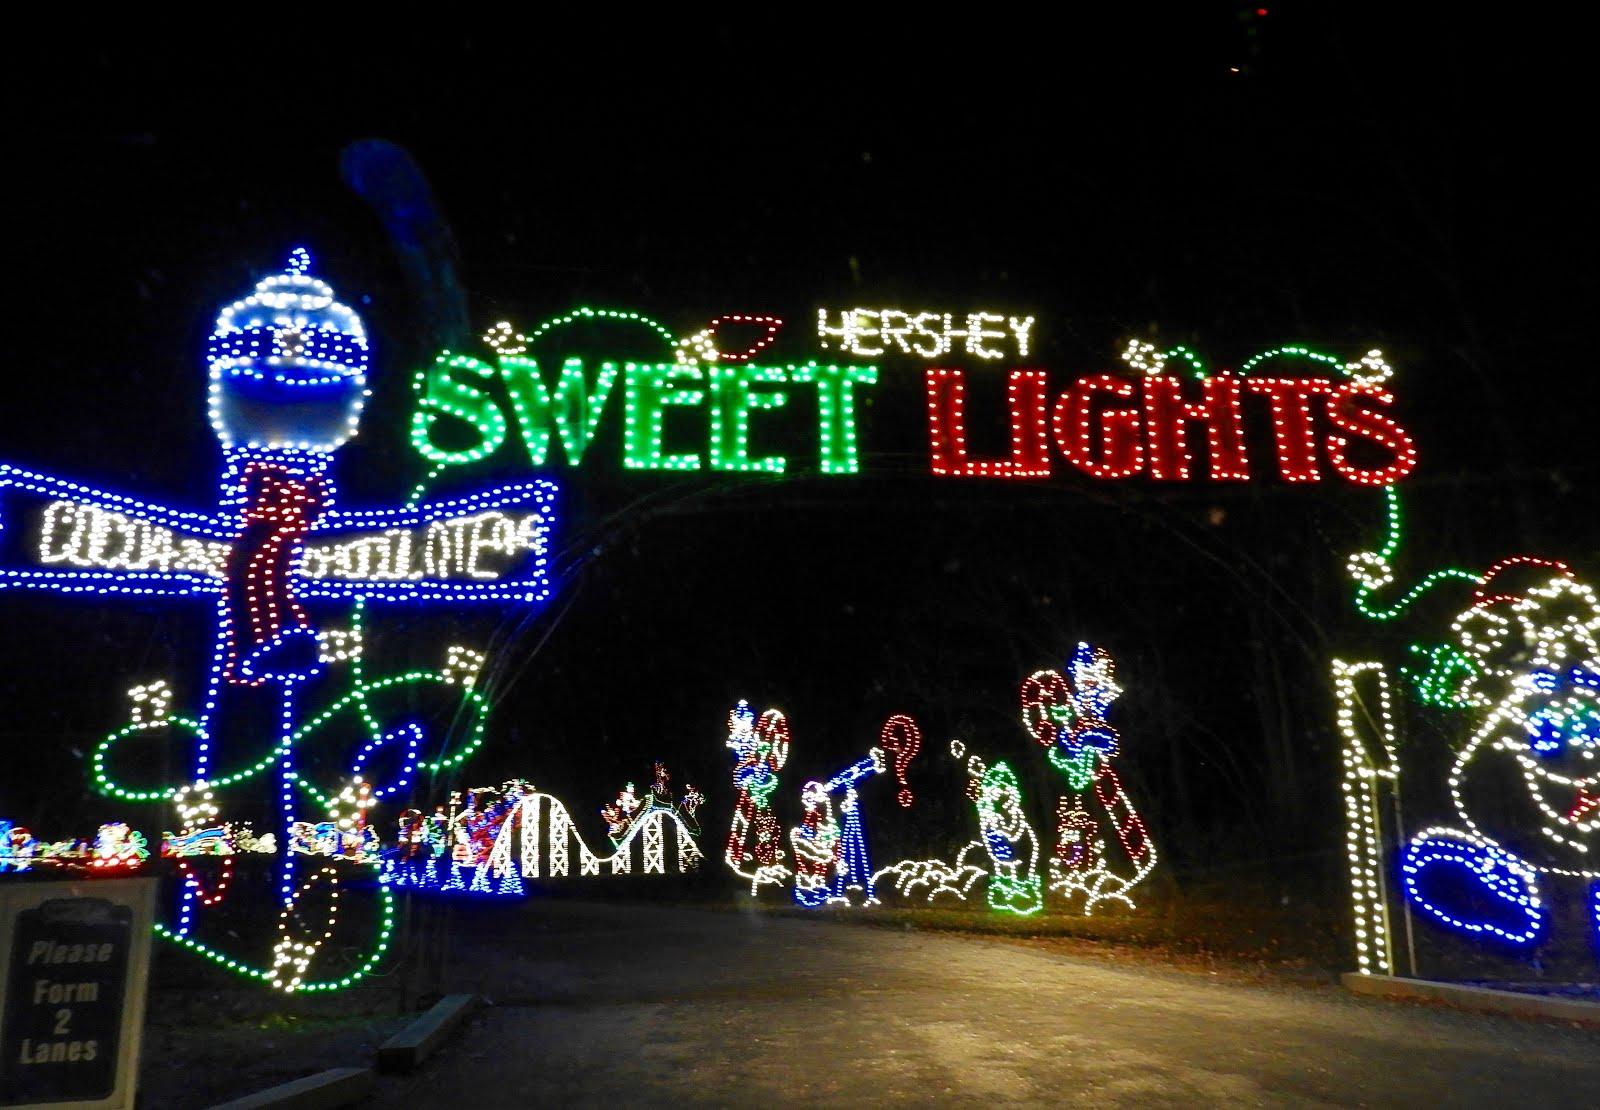 hershey sweet lights - Hershey Christmas Lights